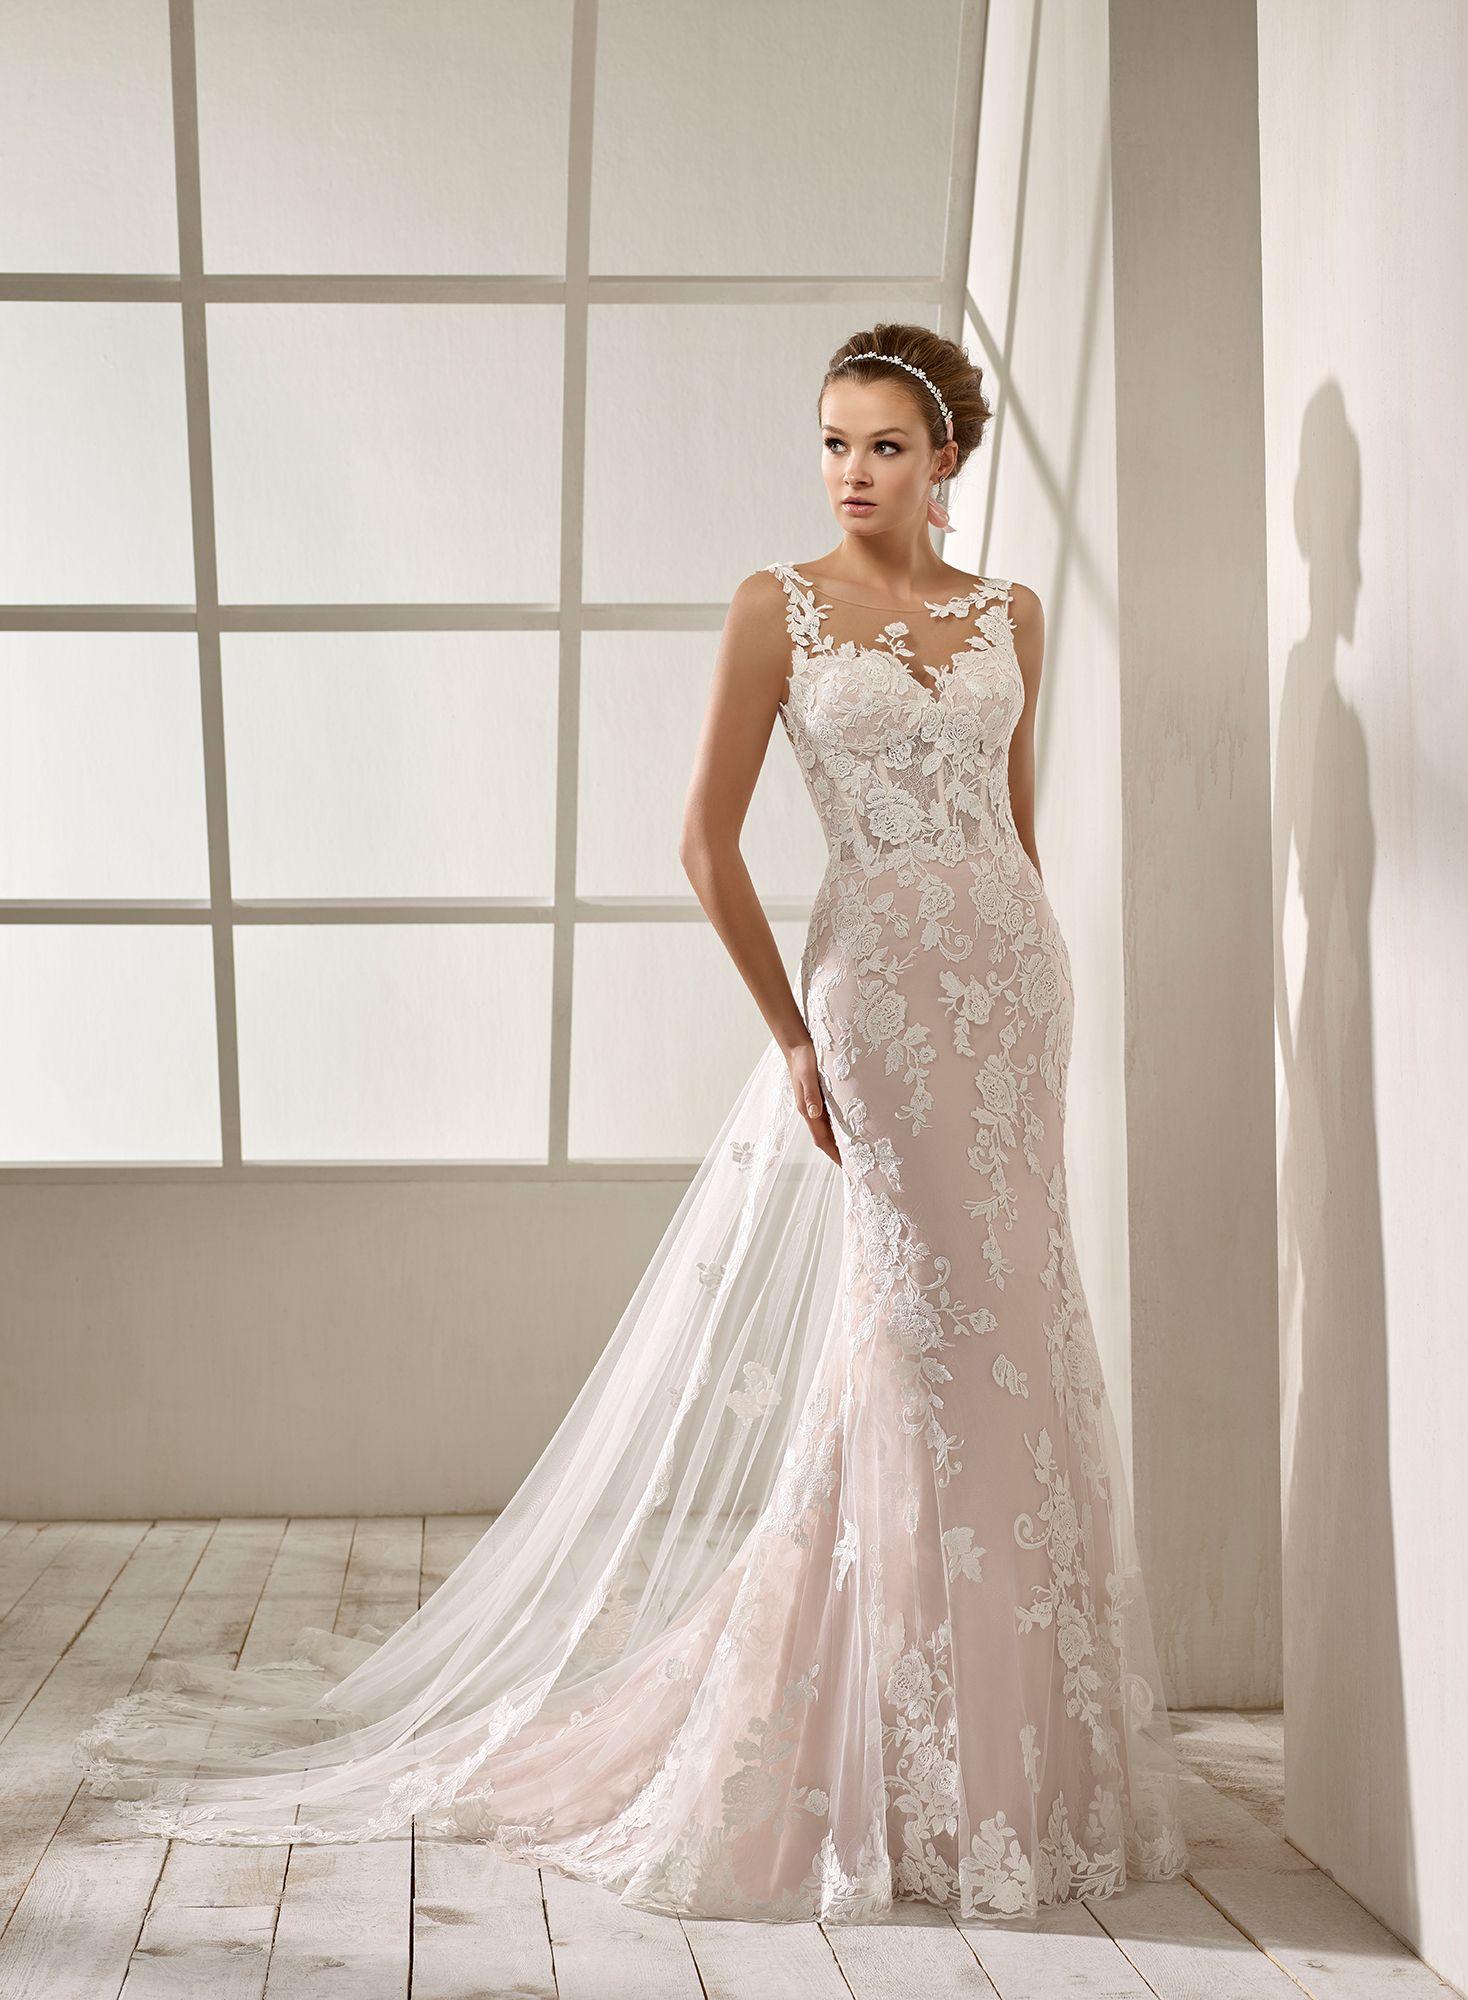 6764abf9 Vestido de Novia de Divina Sposa (DS 19209) #bodas #weddings #bodasnet  #bride #novia #bridelook #bridedress #vestidorosa #rosedress #vestitorosa  #roberose # ...